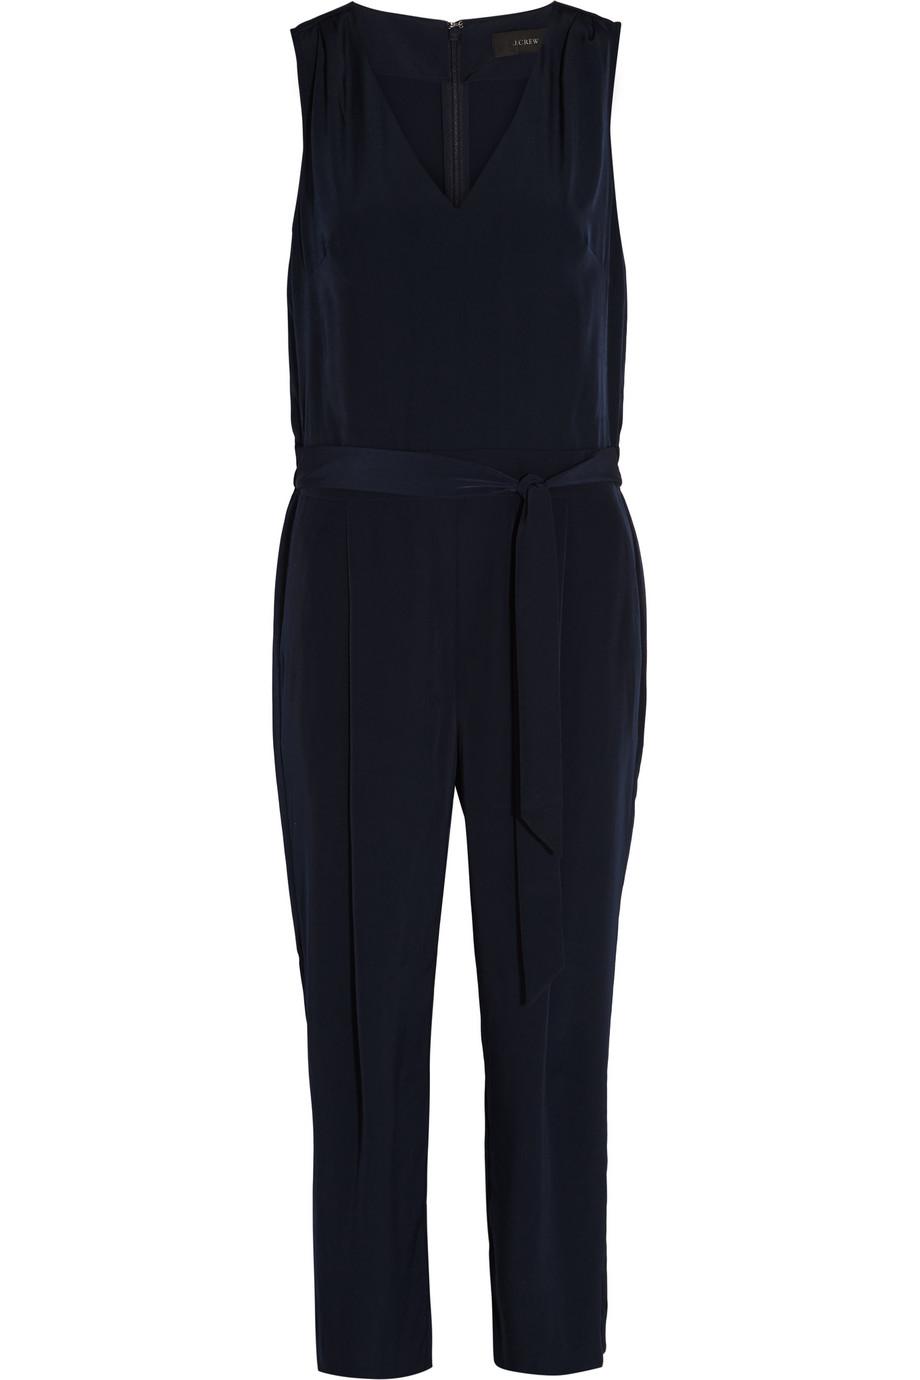 J.Crew Waterloo Satin Jumpsuit, Navy, Women's, Size: 2